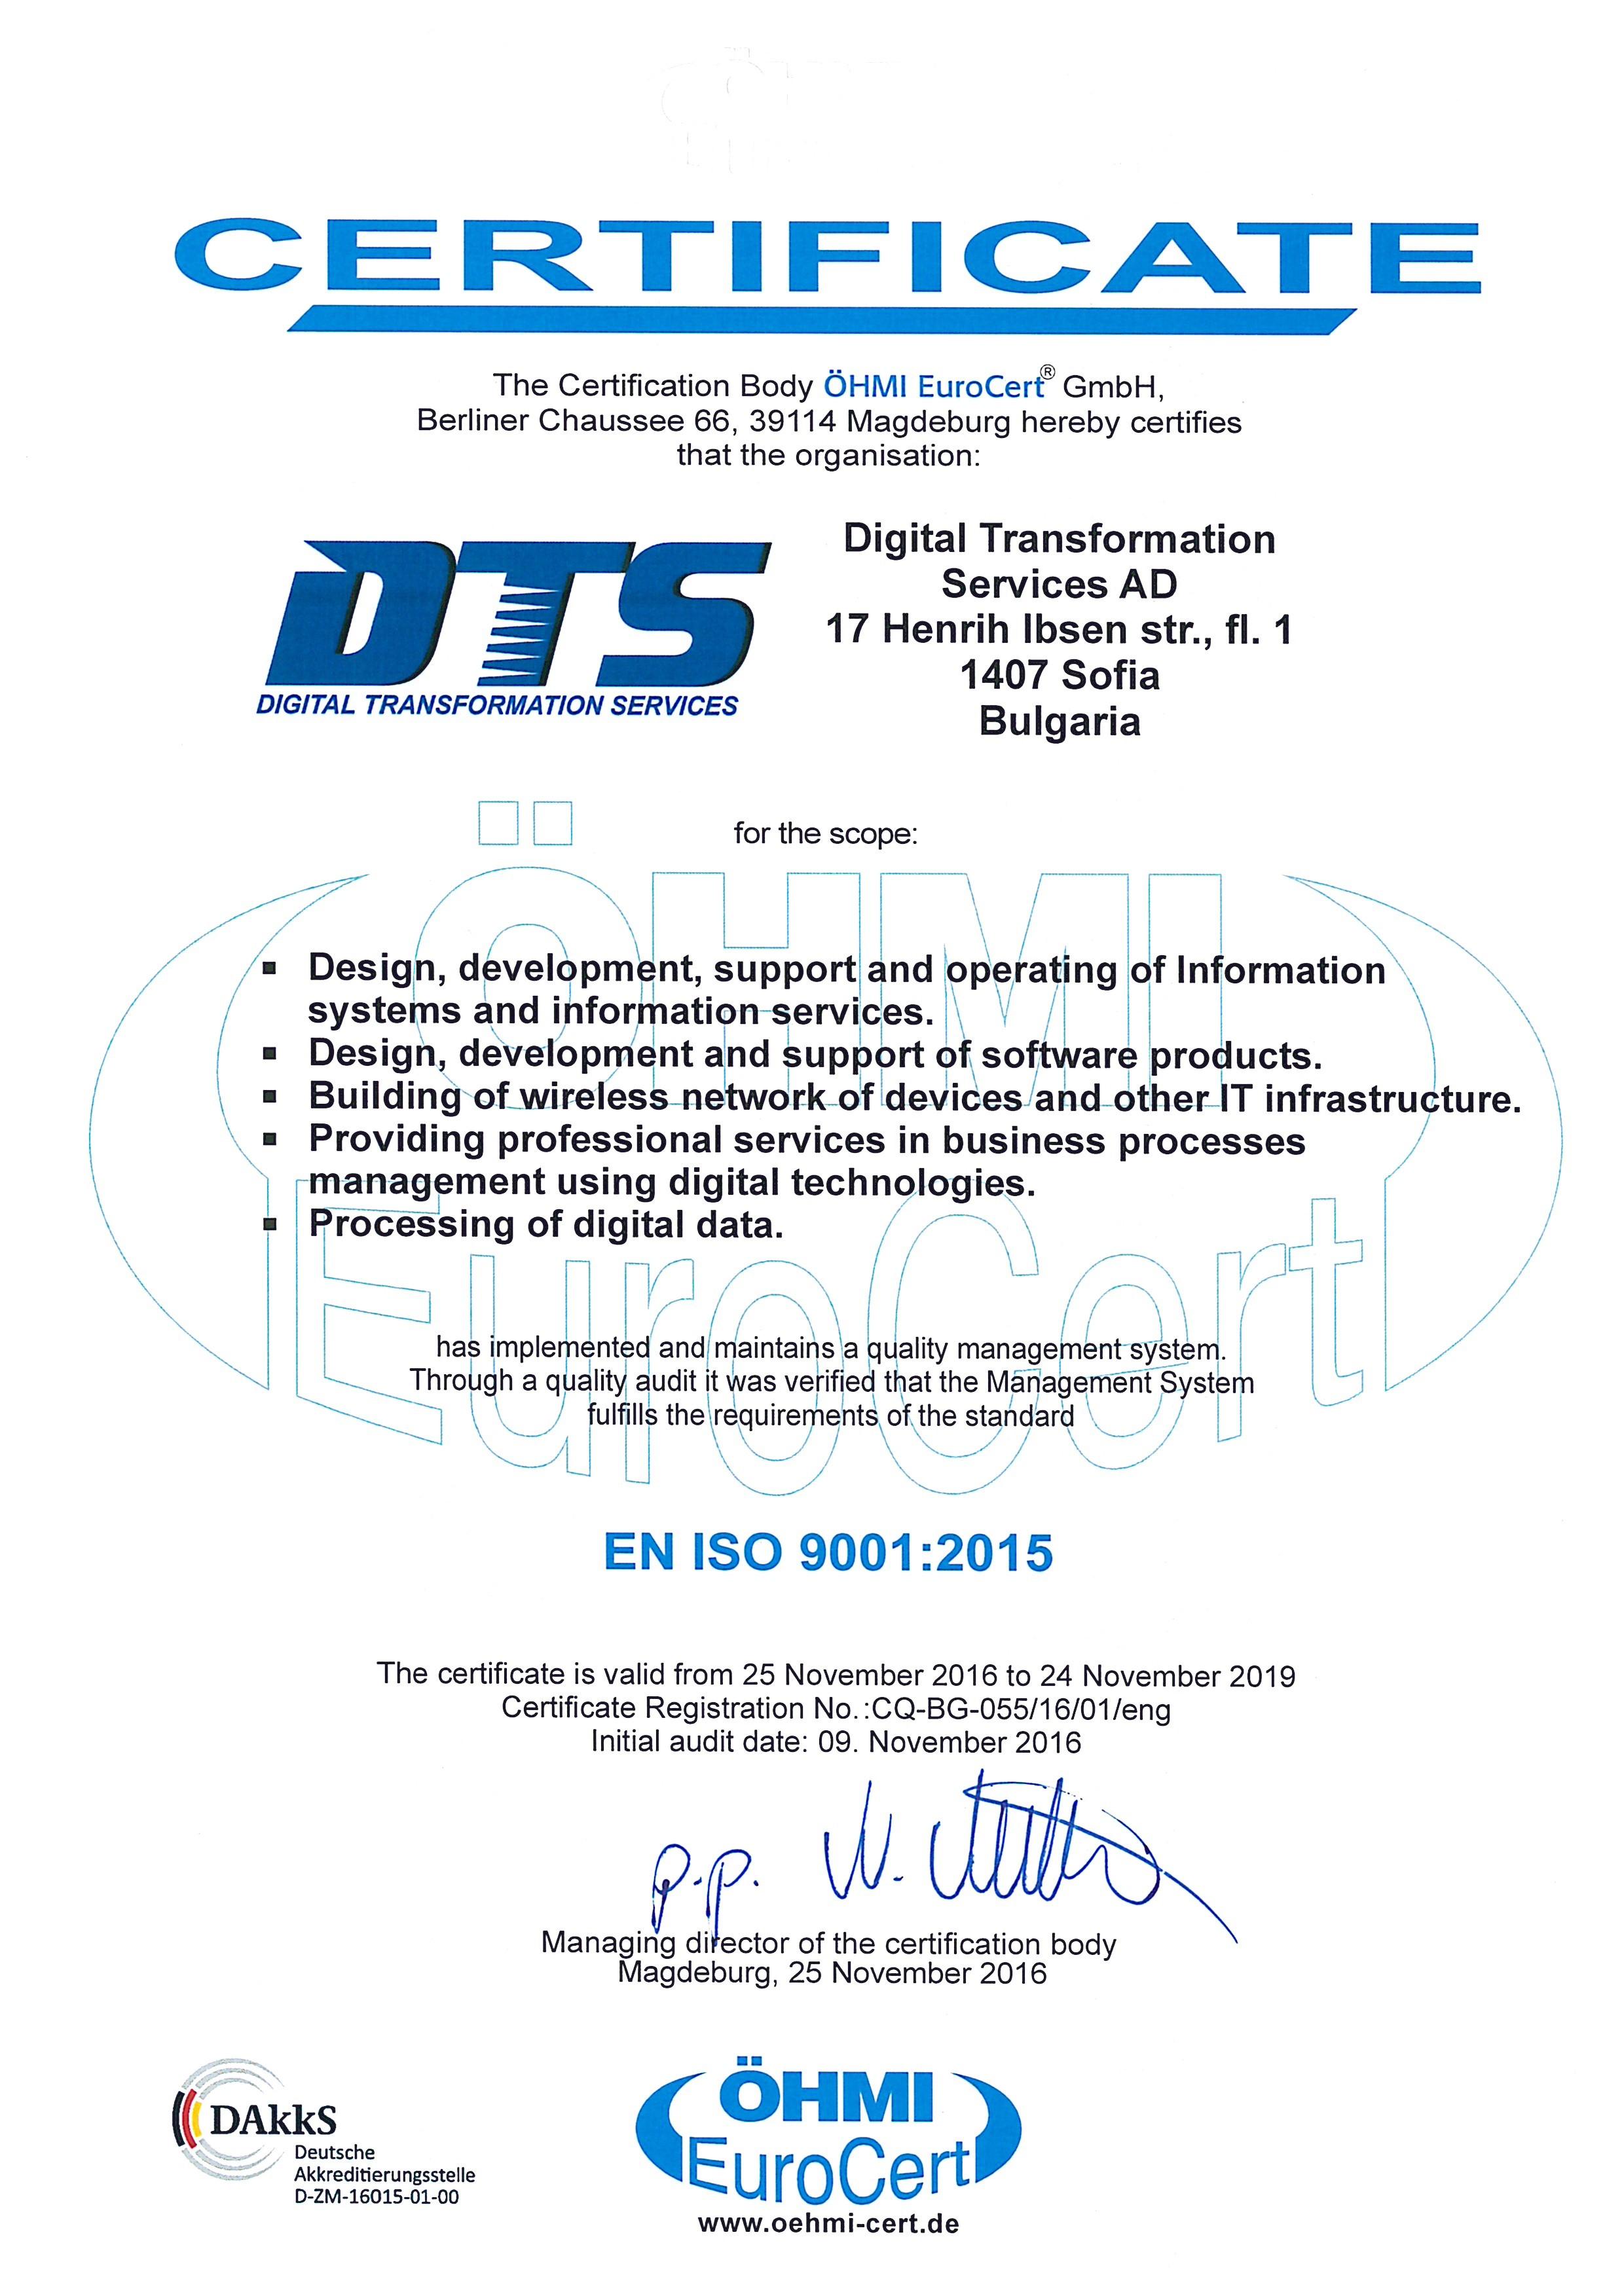 Dts pki certificate best design sertificate 2017 dod pki certificates xflitez Gallery